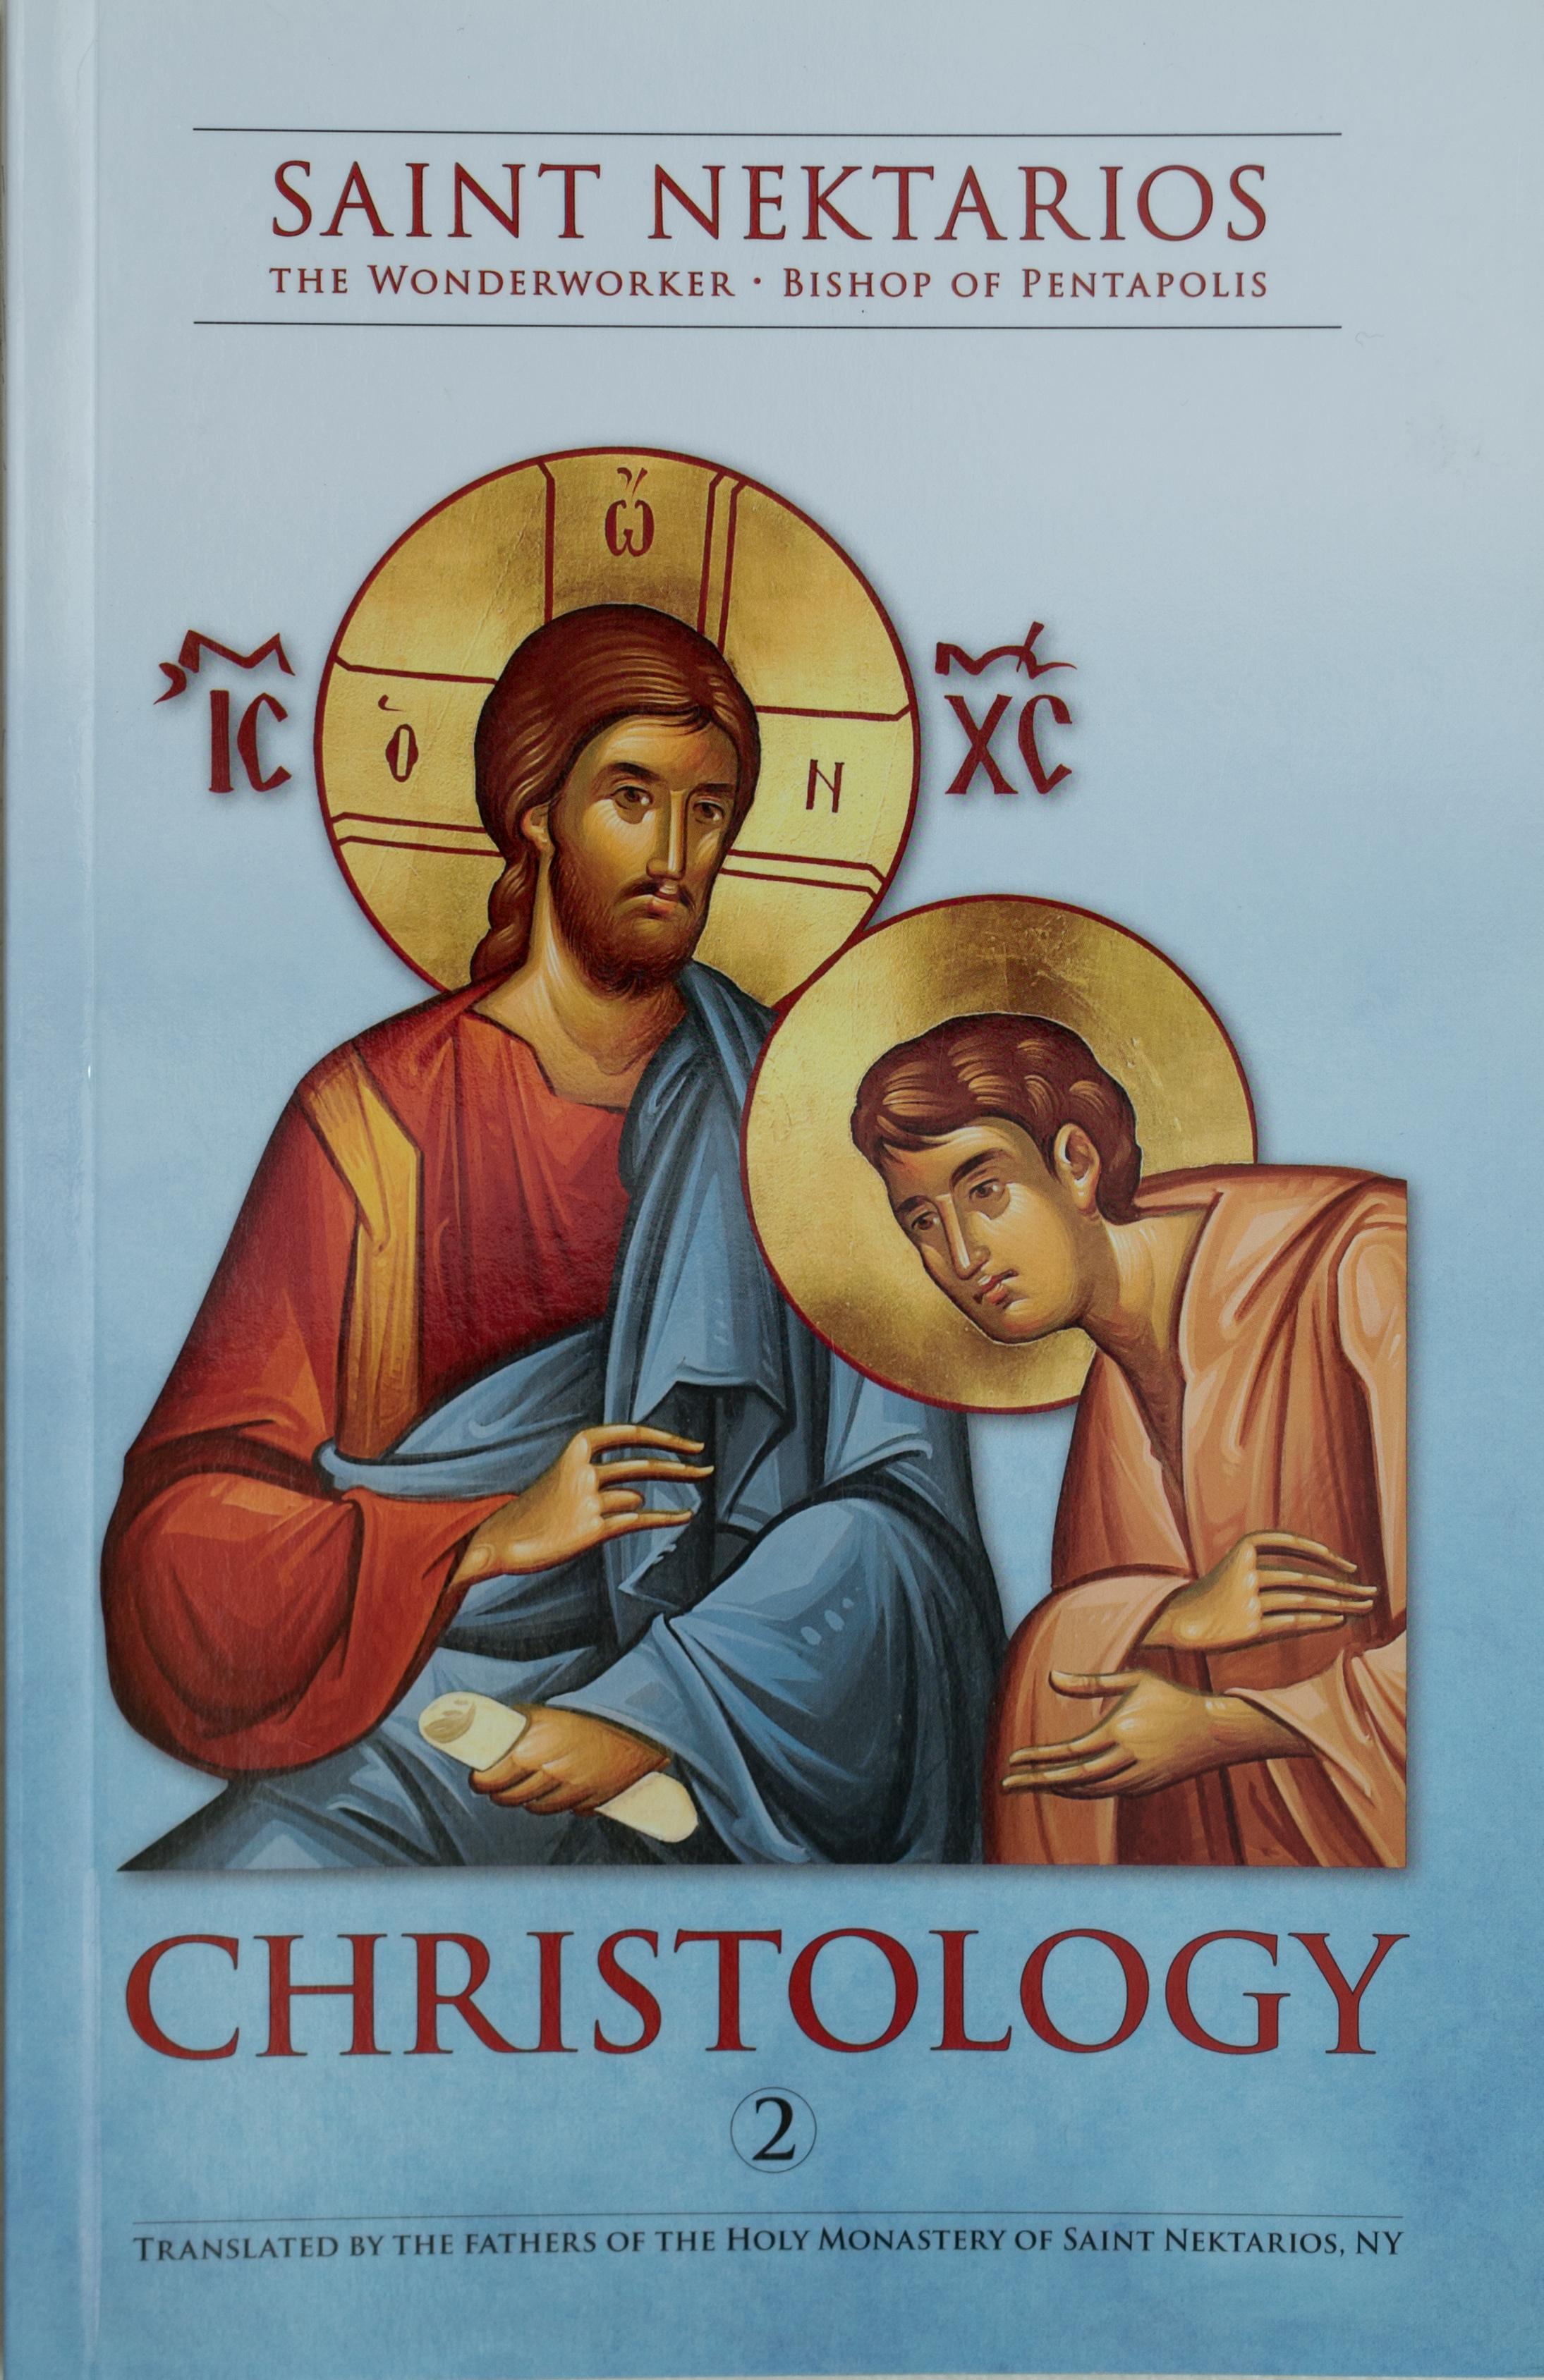 Christology 2